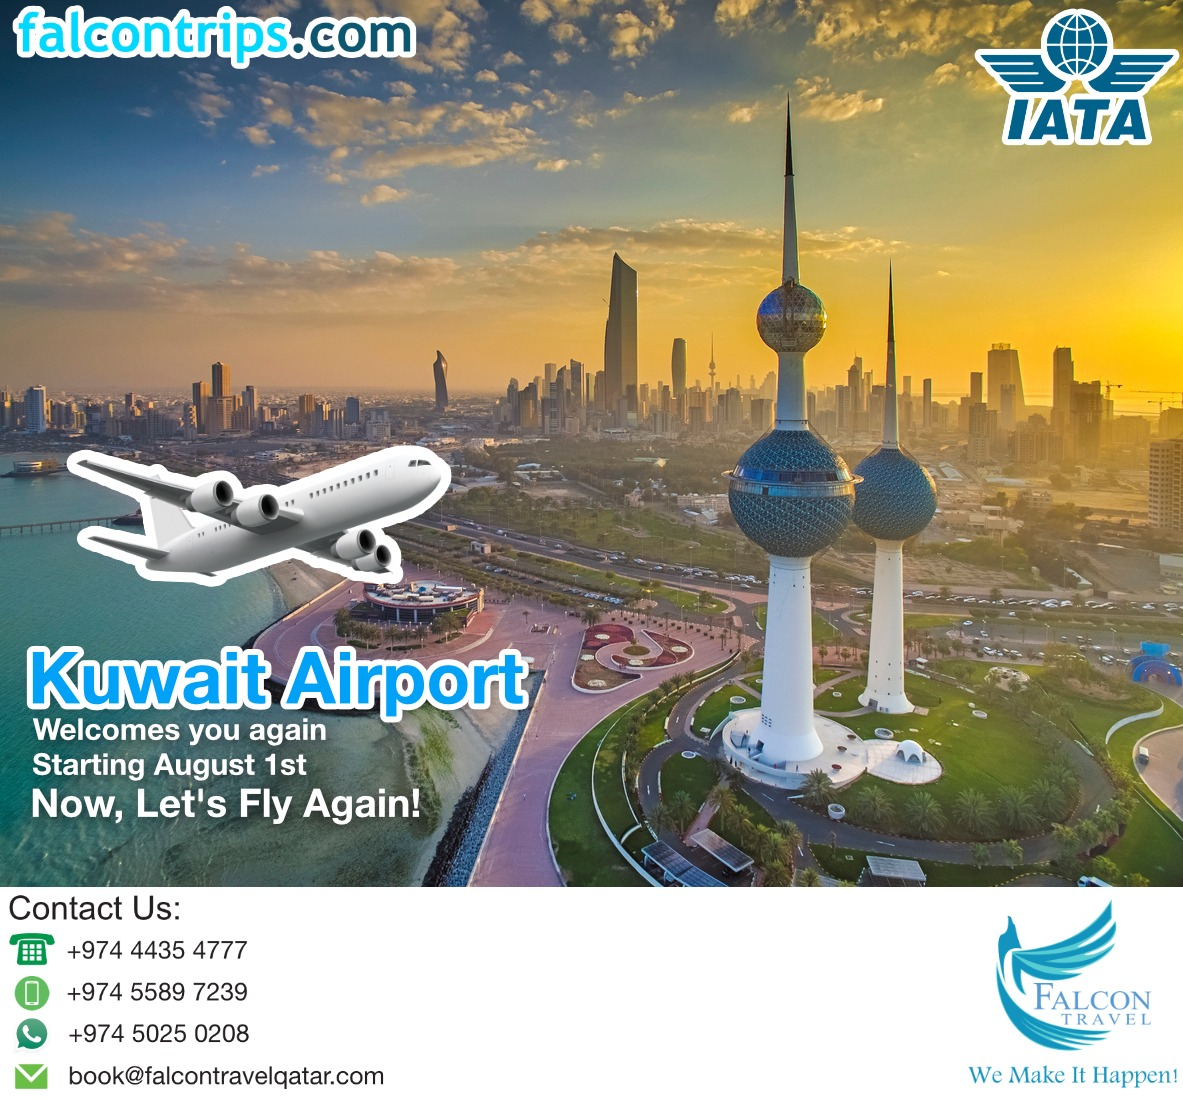 Kuwait Airport, Welcomes you again!  Starting on August 1st.  Now, Let's Fly Again!  --  مطار الكويت  يرحب بكم مرة أخرى  اعتبارًا من 1 أغسطس  الآن ، لنطير مرة أخرى!  #KuwaitAirport #Bookyourseatsnow#BookNowTravelLater  #Travelgram #TravelAgency pic.twitter.com/Zfk6GWbB0Q